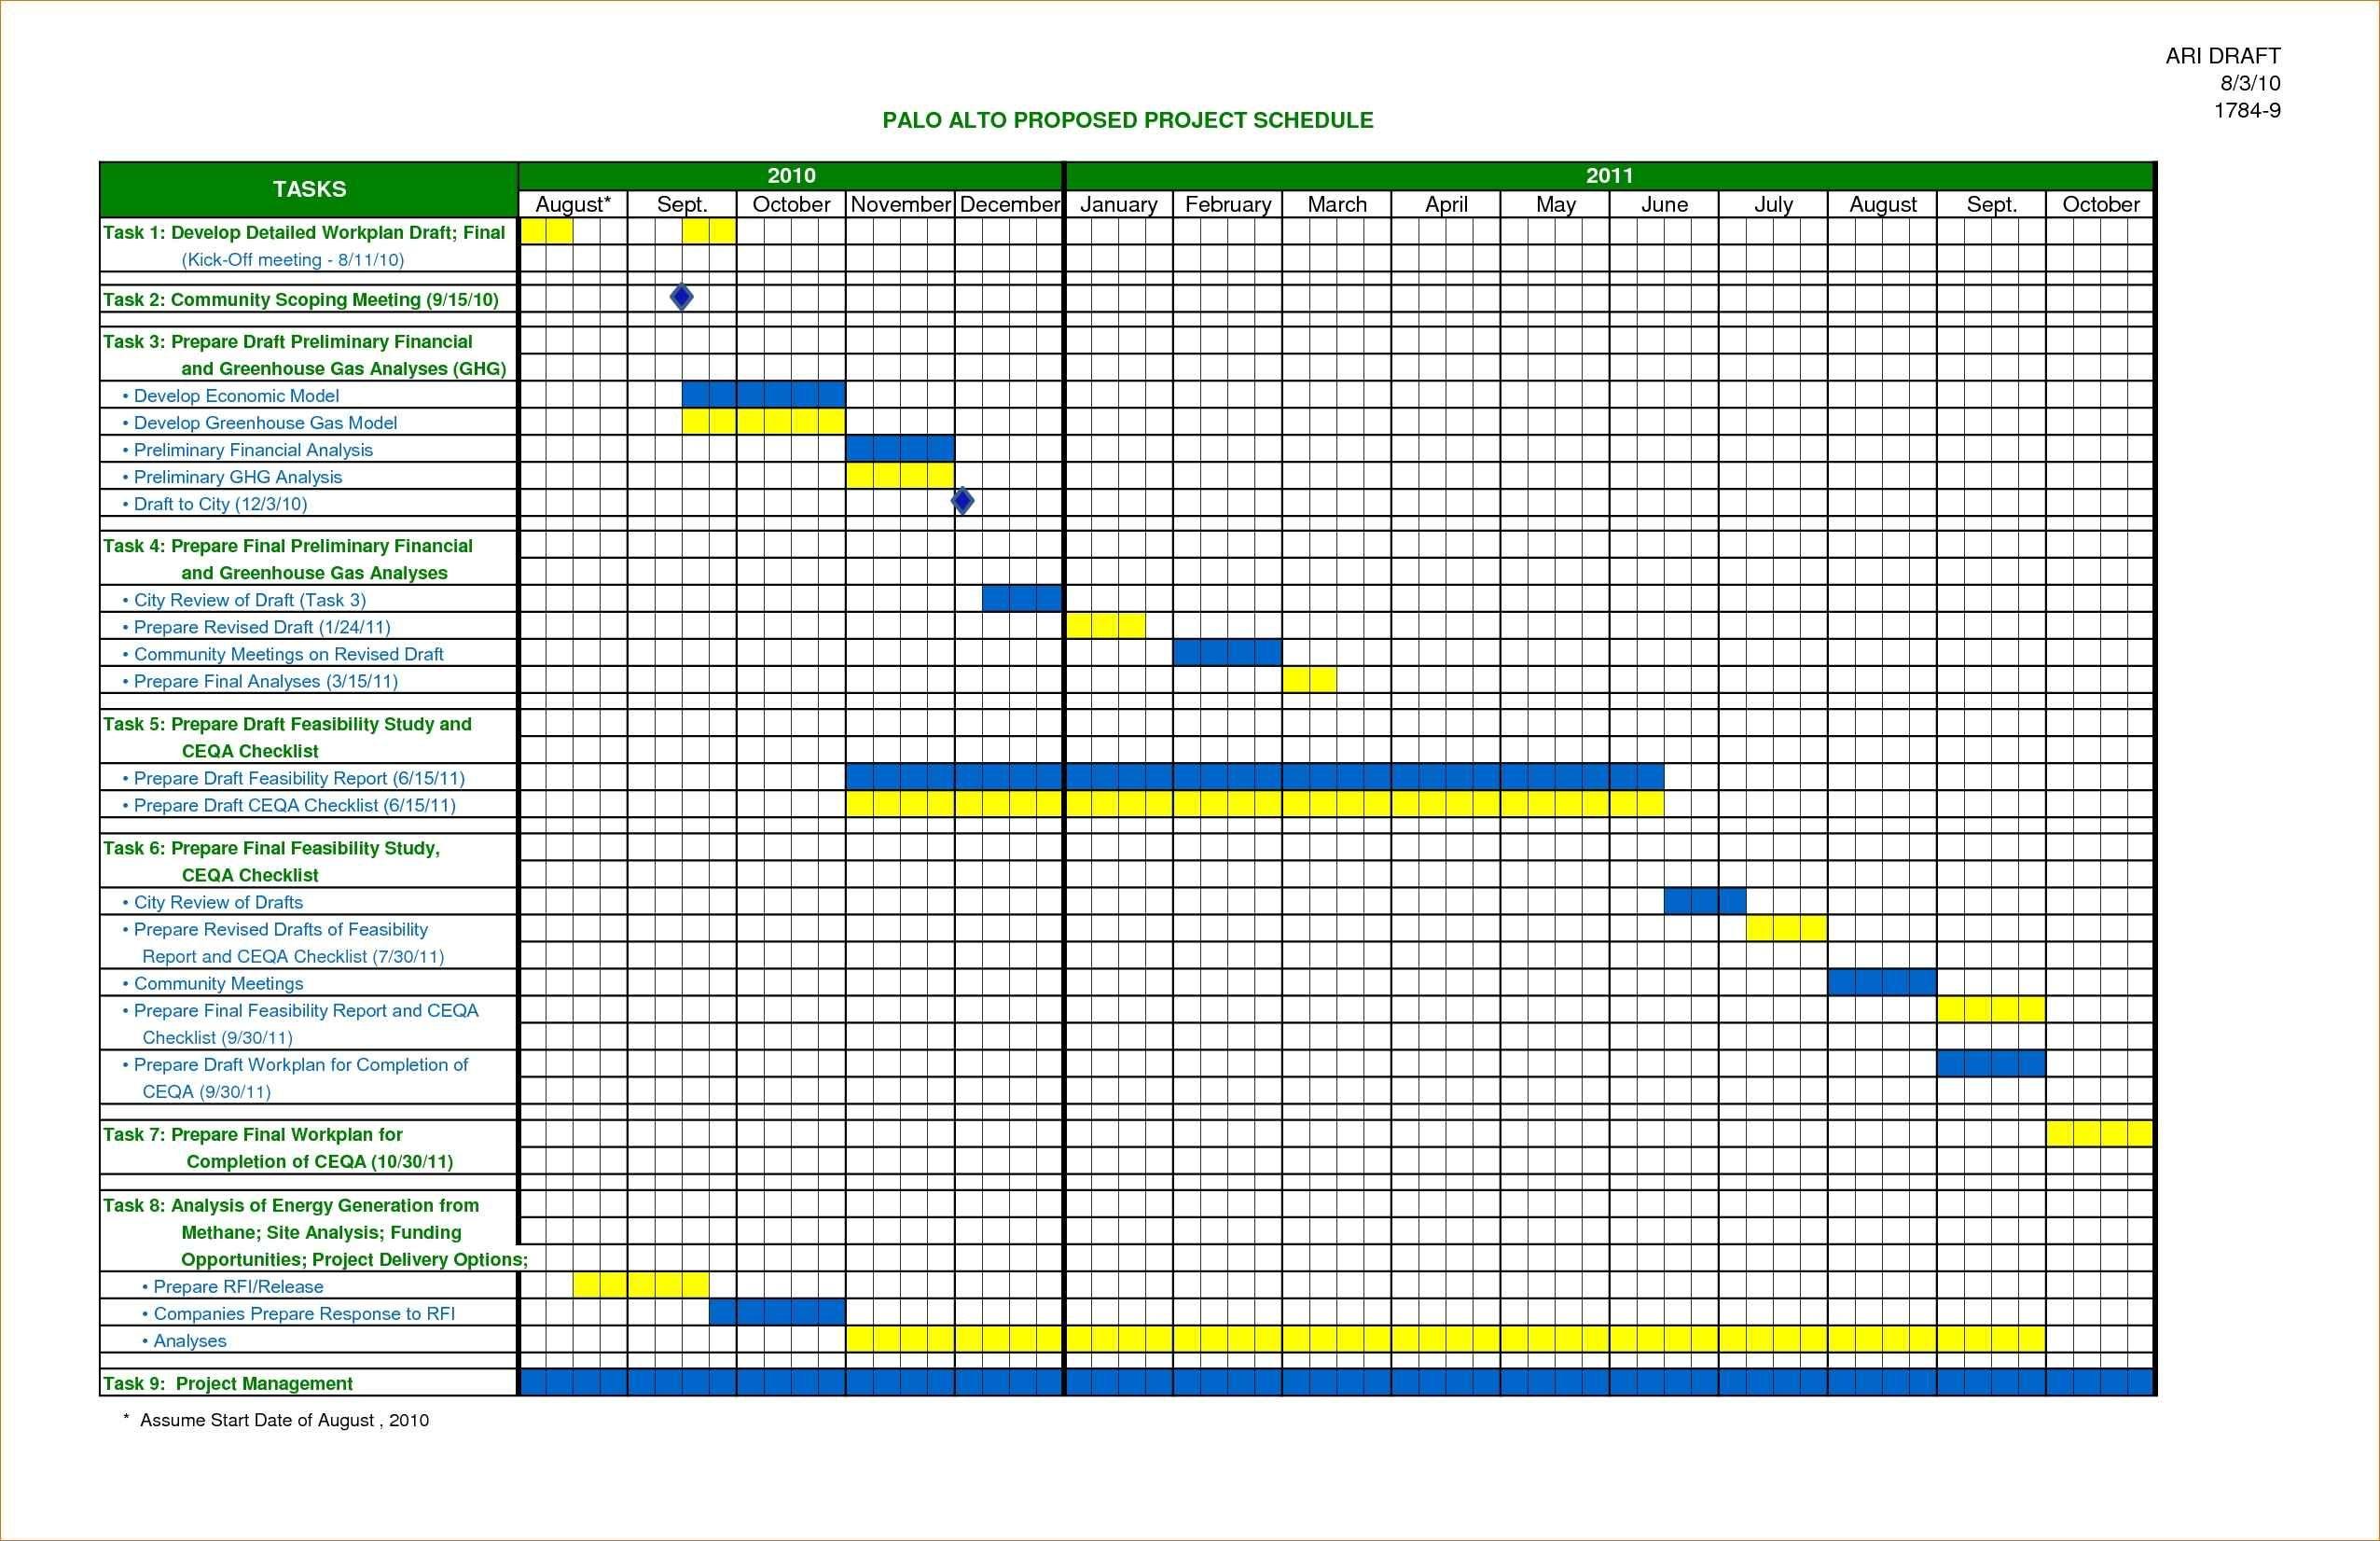 Monthly Employee Schedule Template Excel In 2020 Excel Templates Project Timeline Template Schedule Template